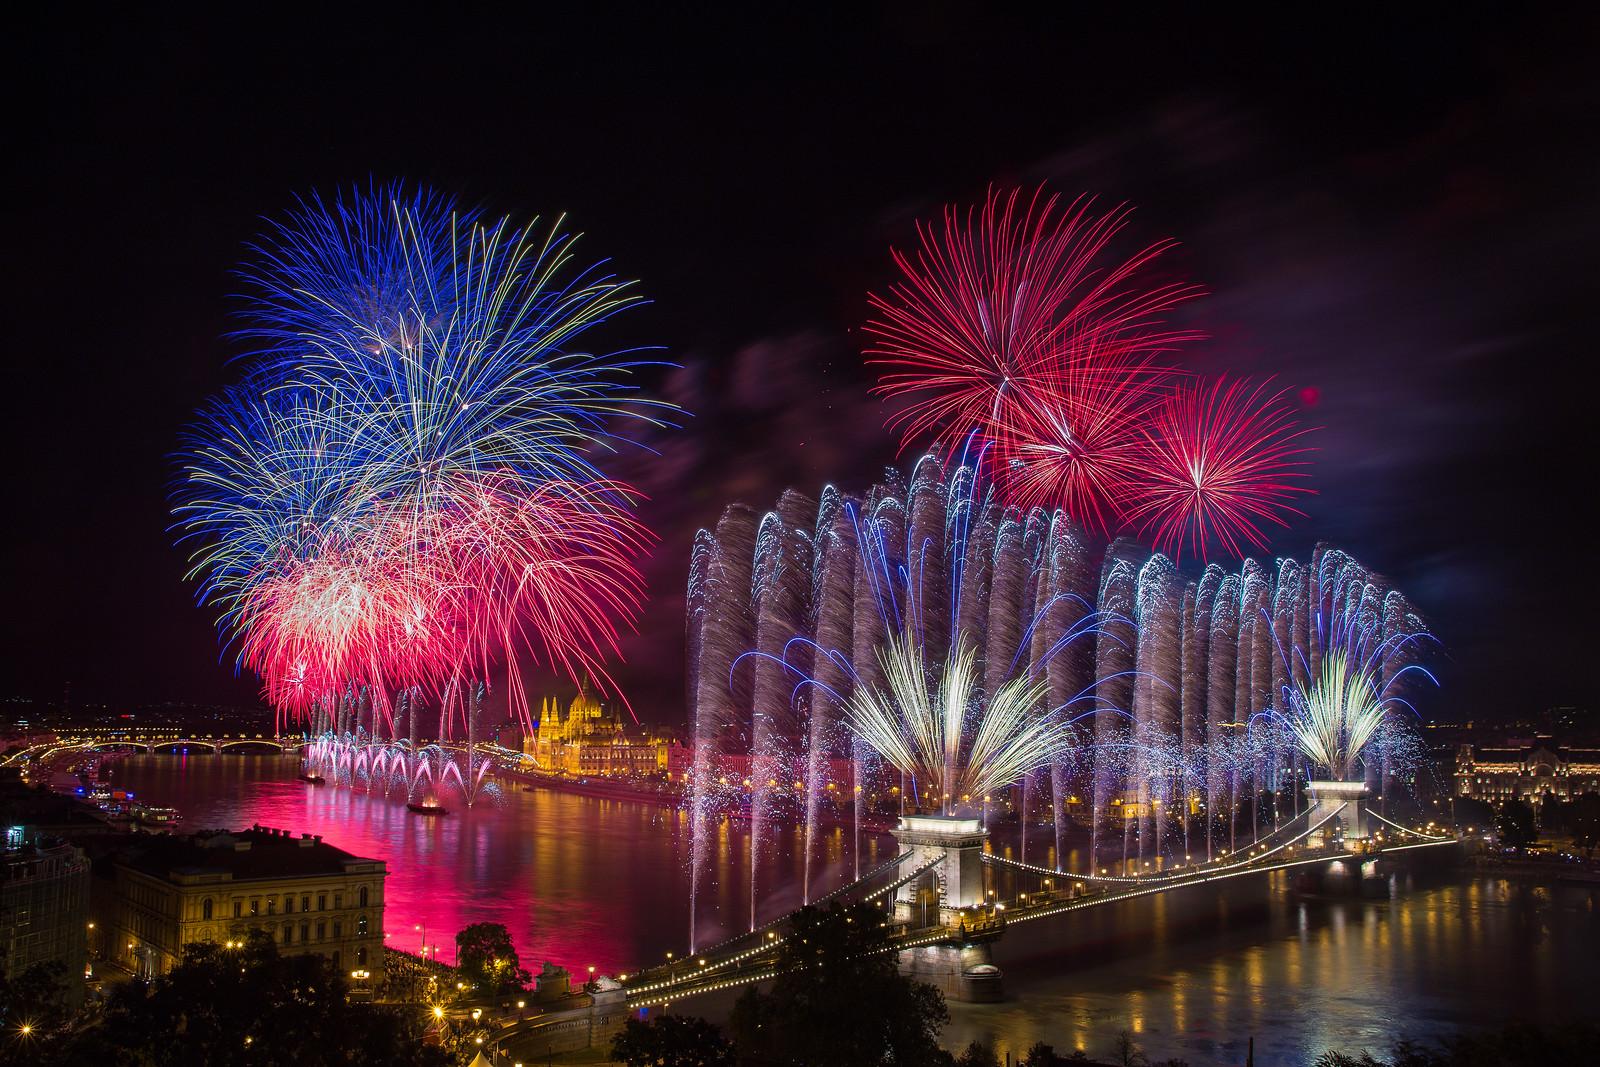 budapest fireworks st stephen's day chain bridge